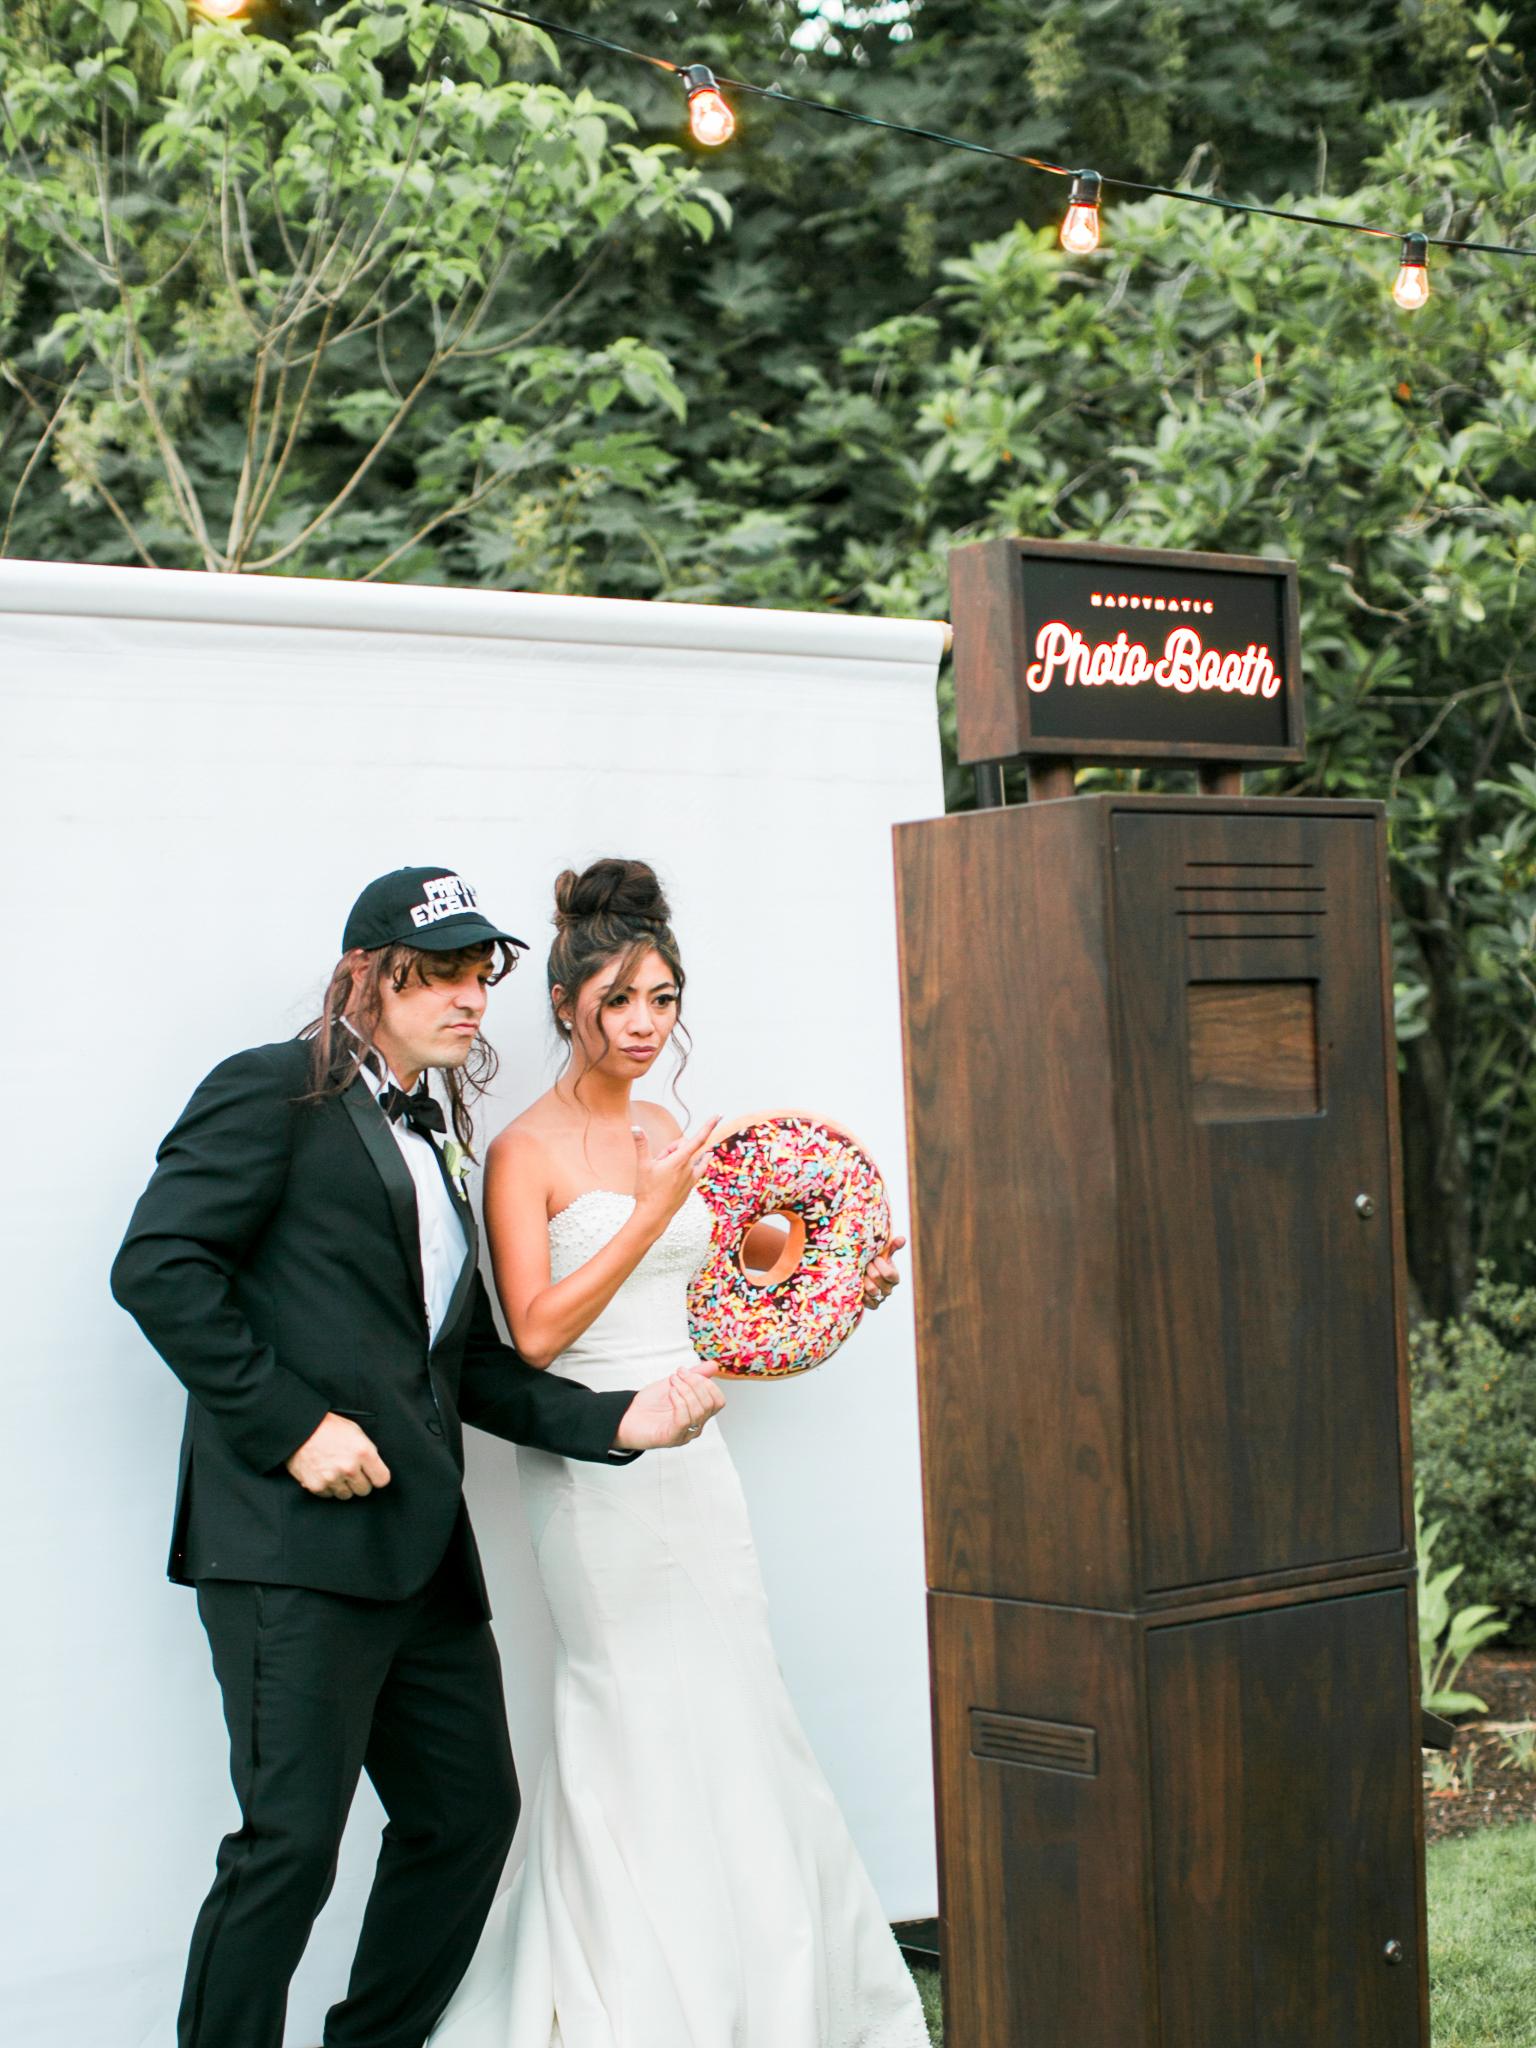 215OutliveCreative_Travel_Photographer_Videographer_Lewis&Clark_Oregon_Elegant_BlackTie_Destination_Wedding.jpg